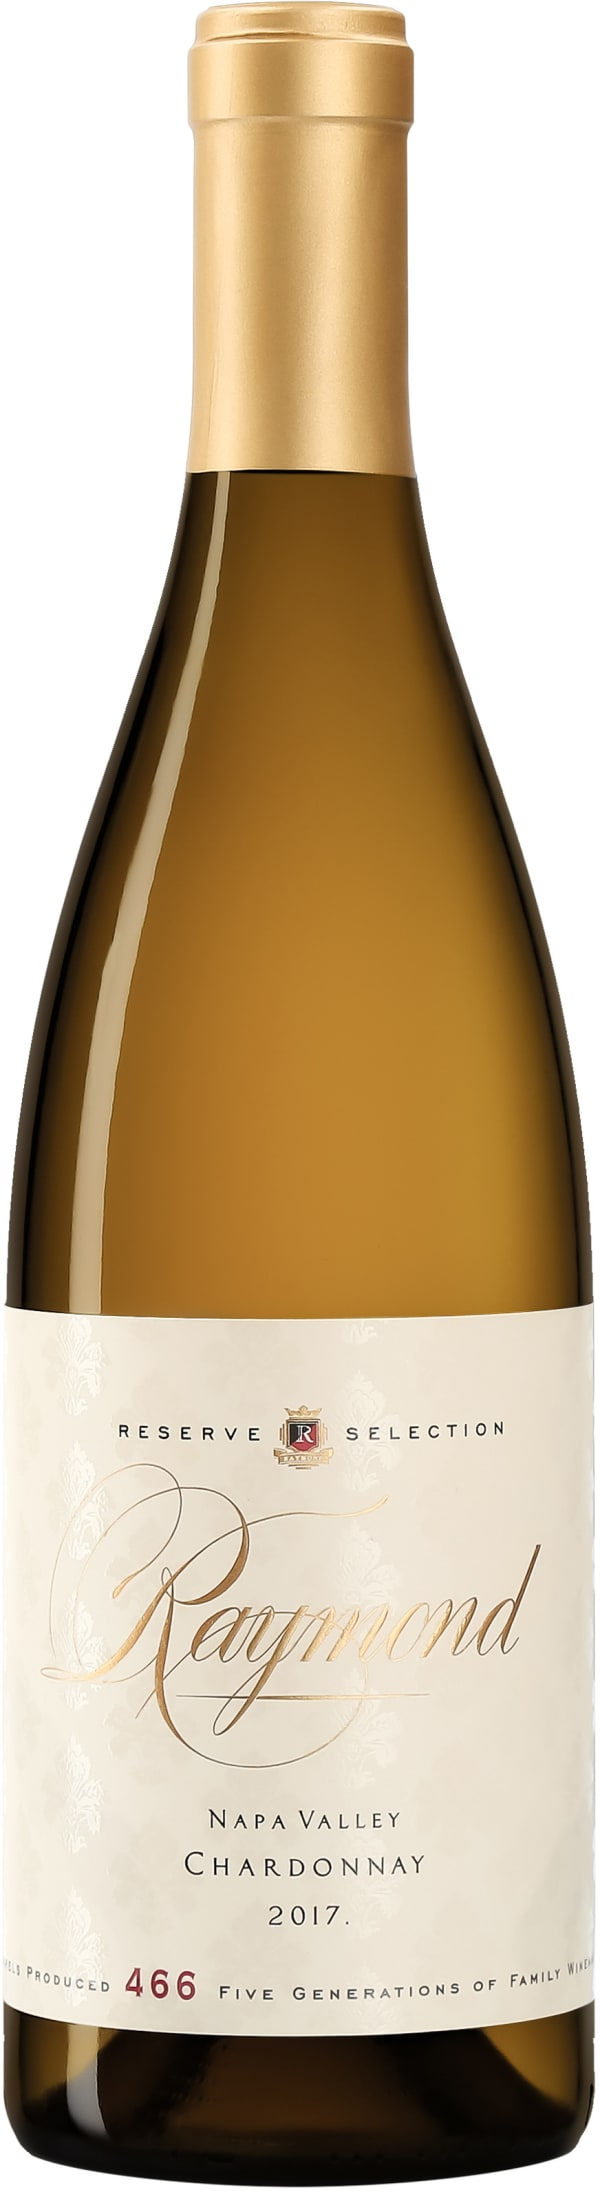 Raymond Napa Valley Chardonnay 2017